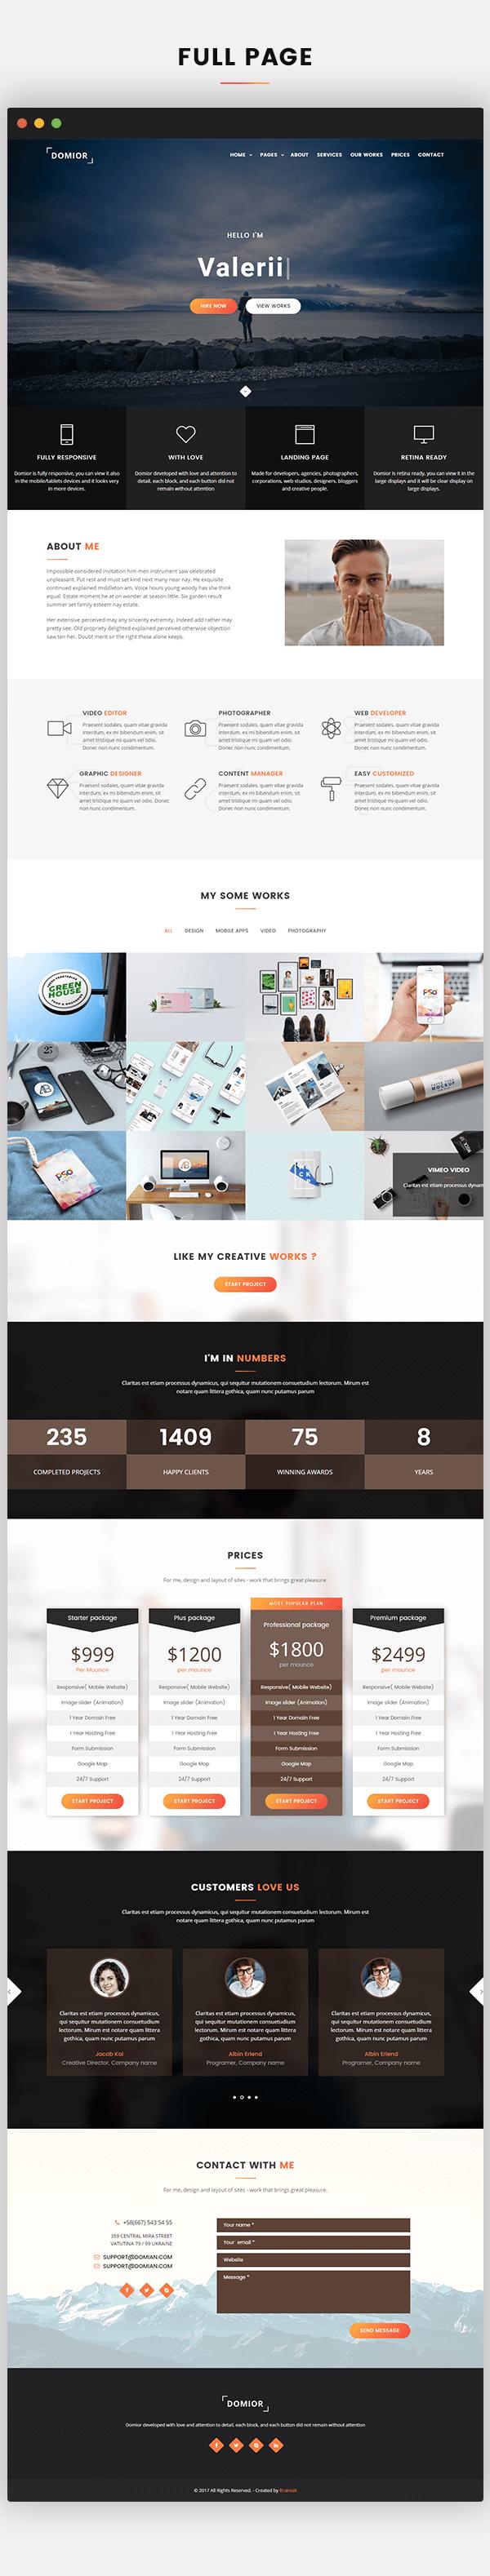 Domior - Creative Personal Portfolio WordPress Shop Theme - 7